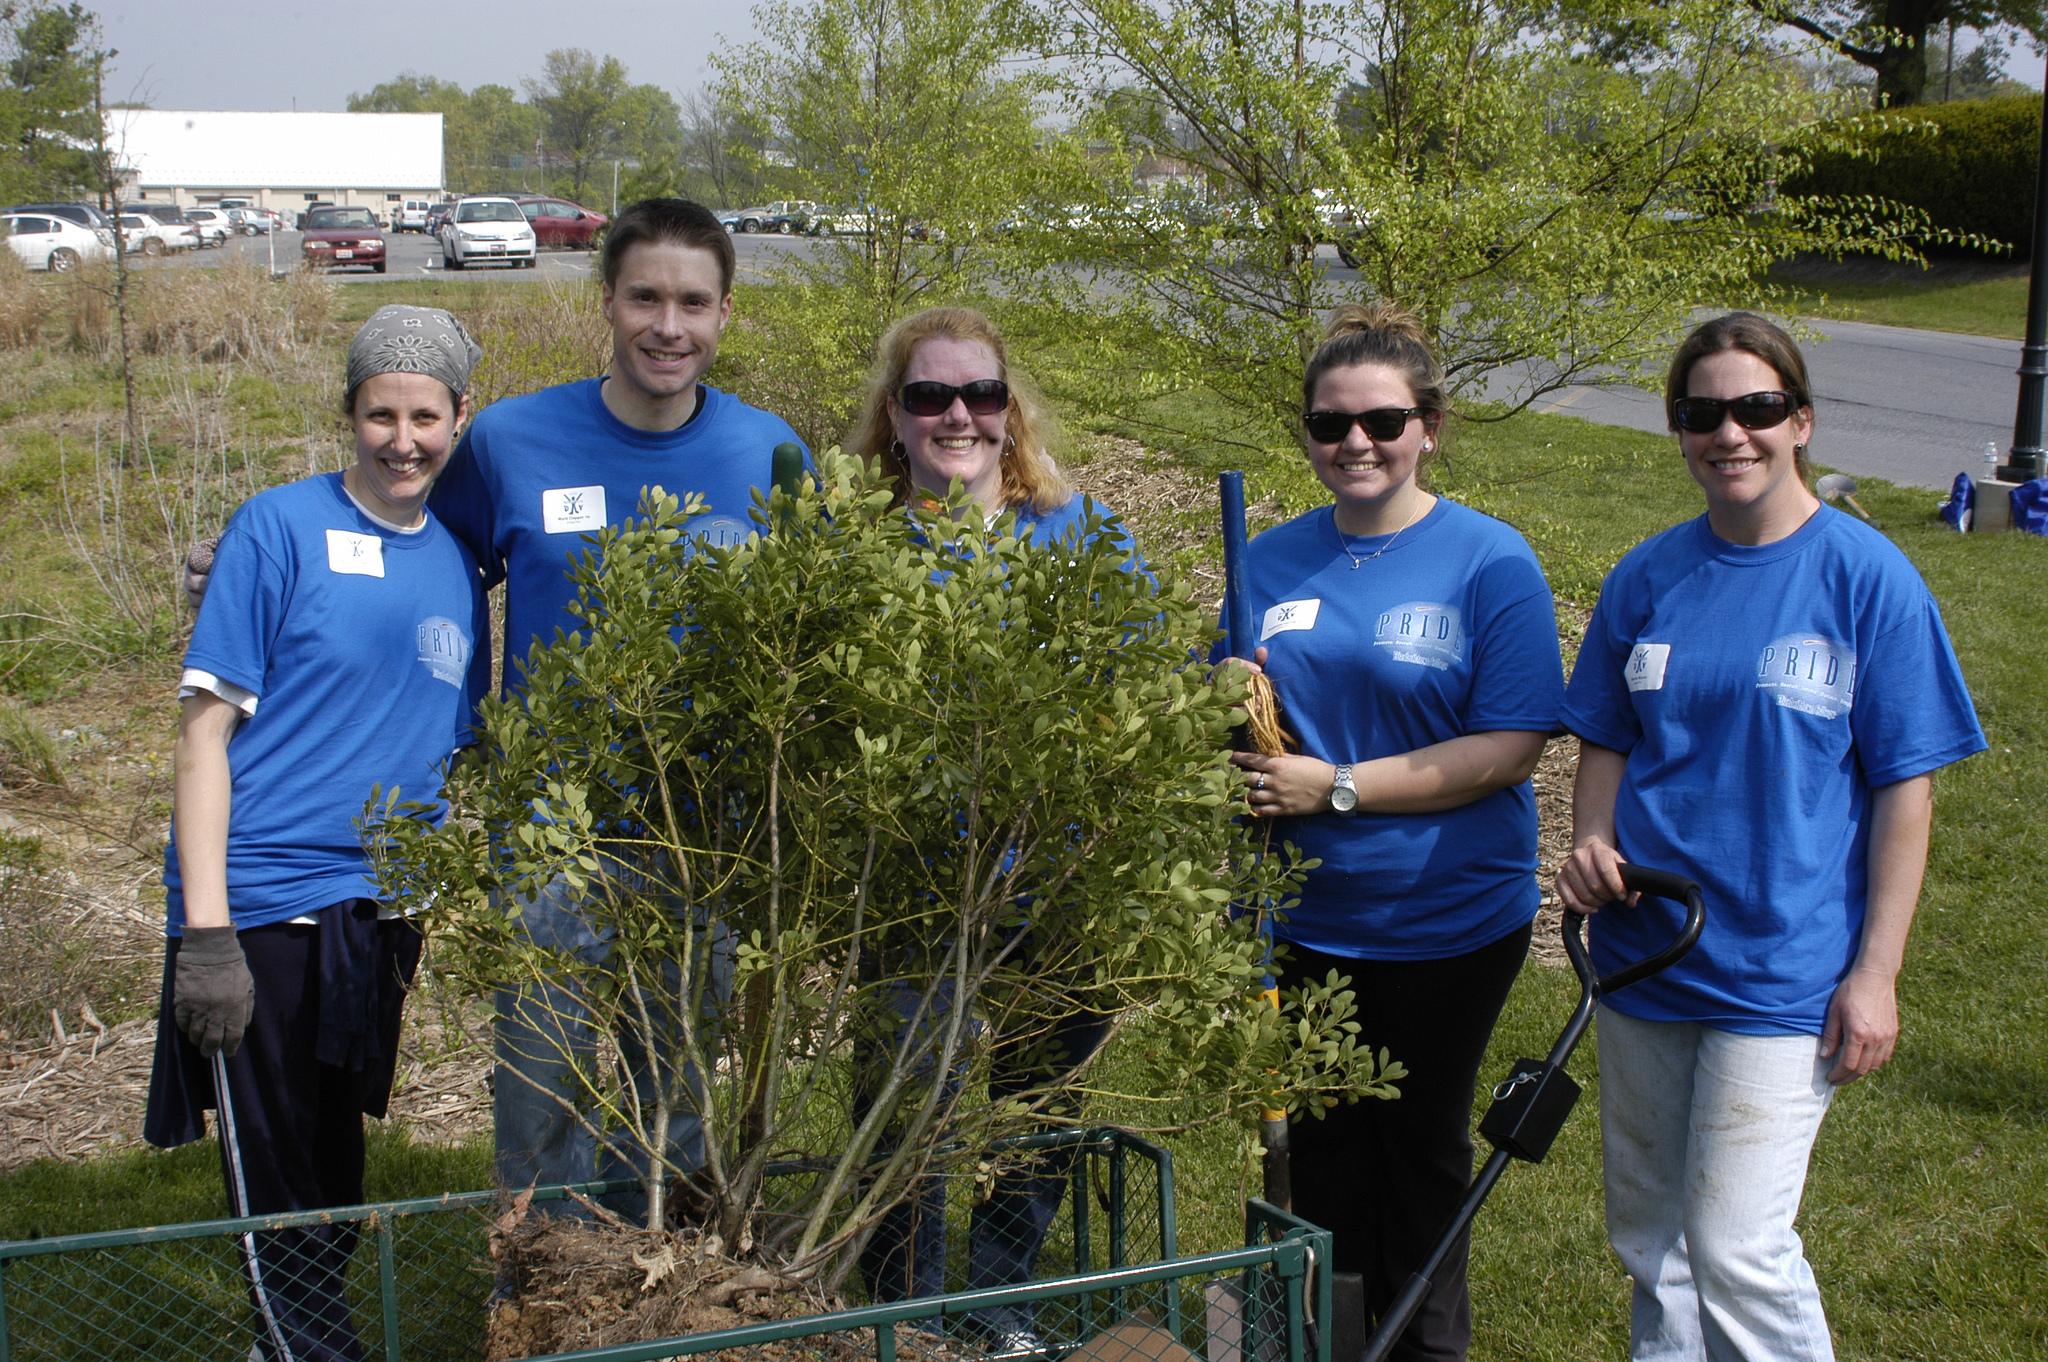 Volunteers Help Clean Up Campus For PRIDE Day